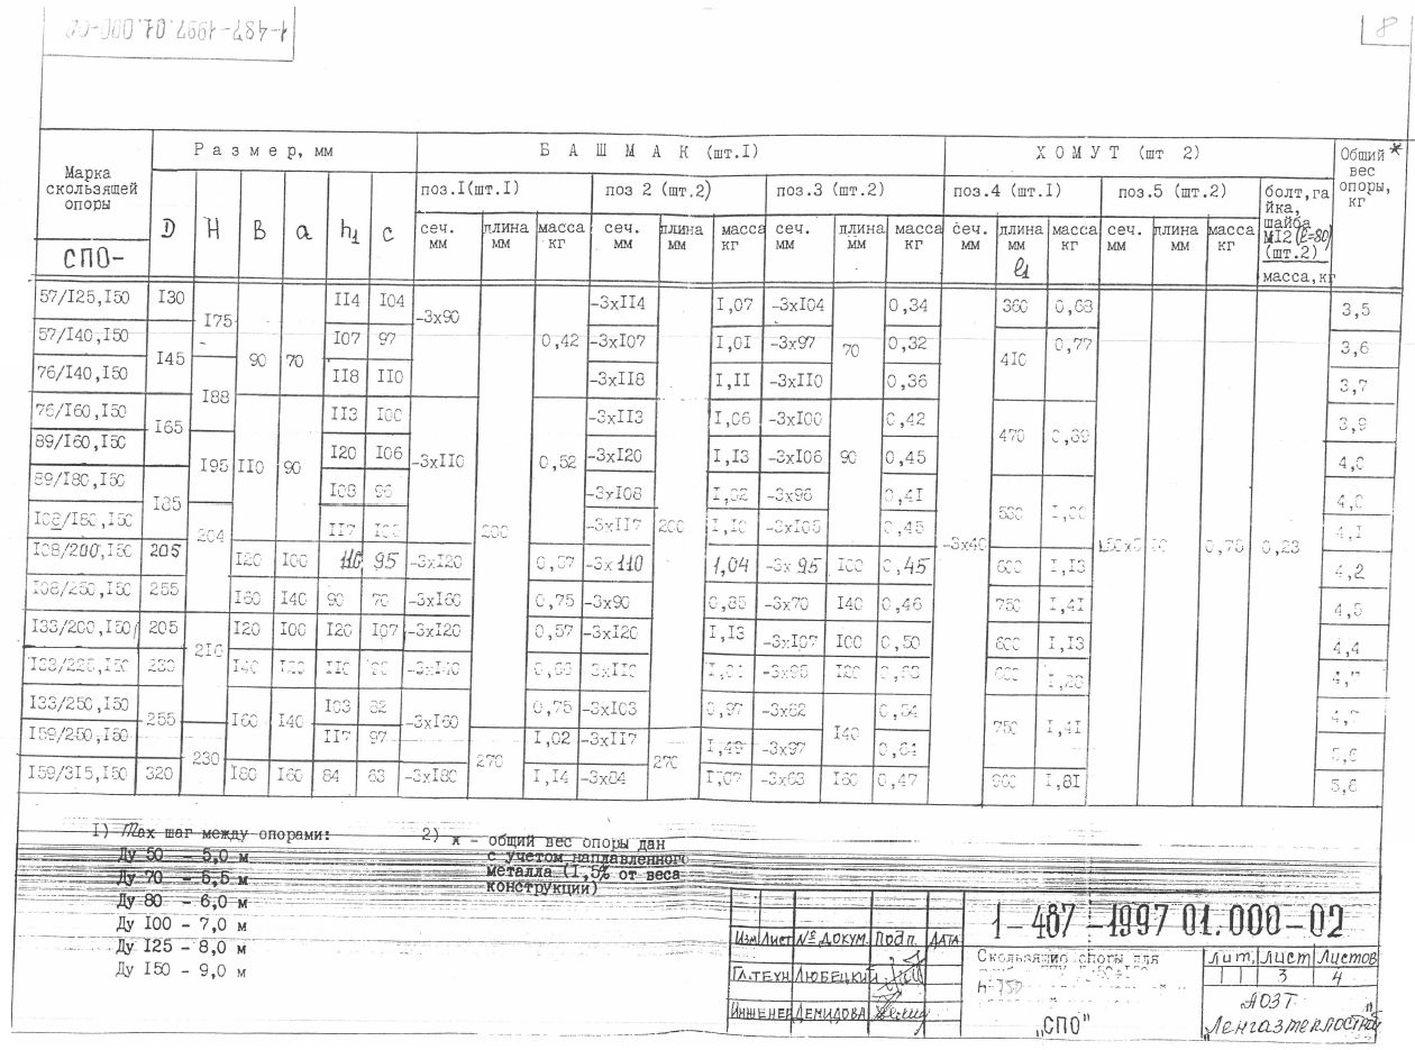 Опоры СПО ТД 1-487-1997.01.000-02 стр.3